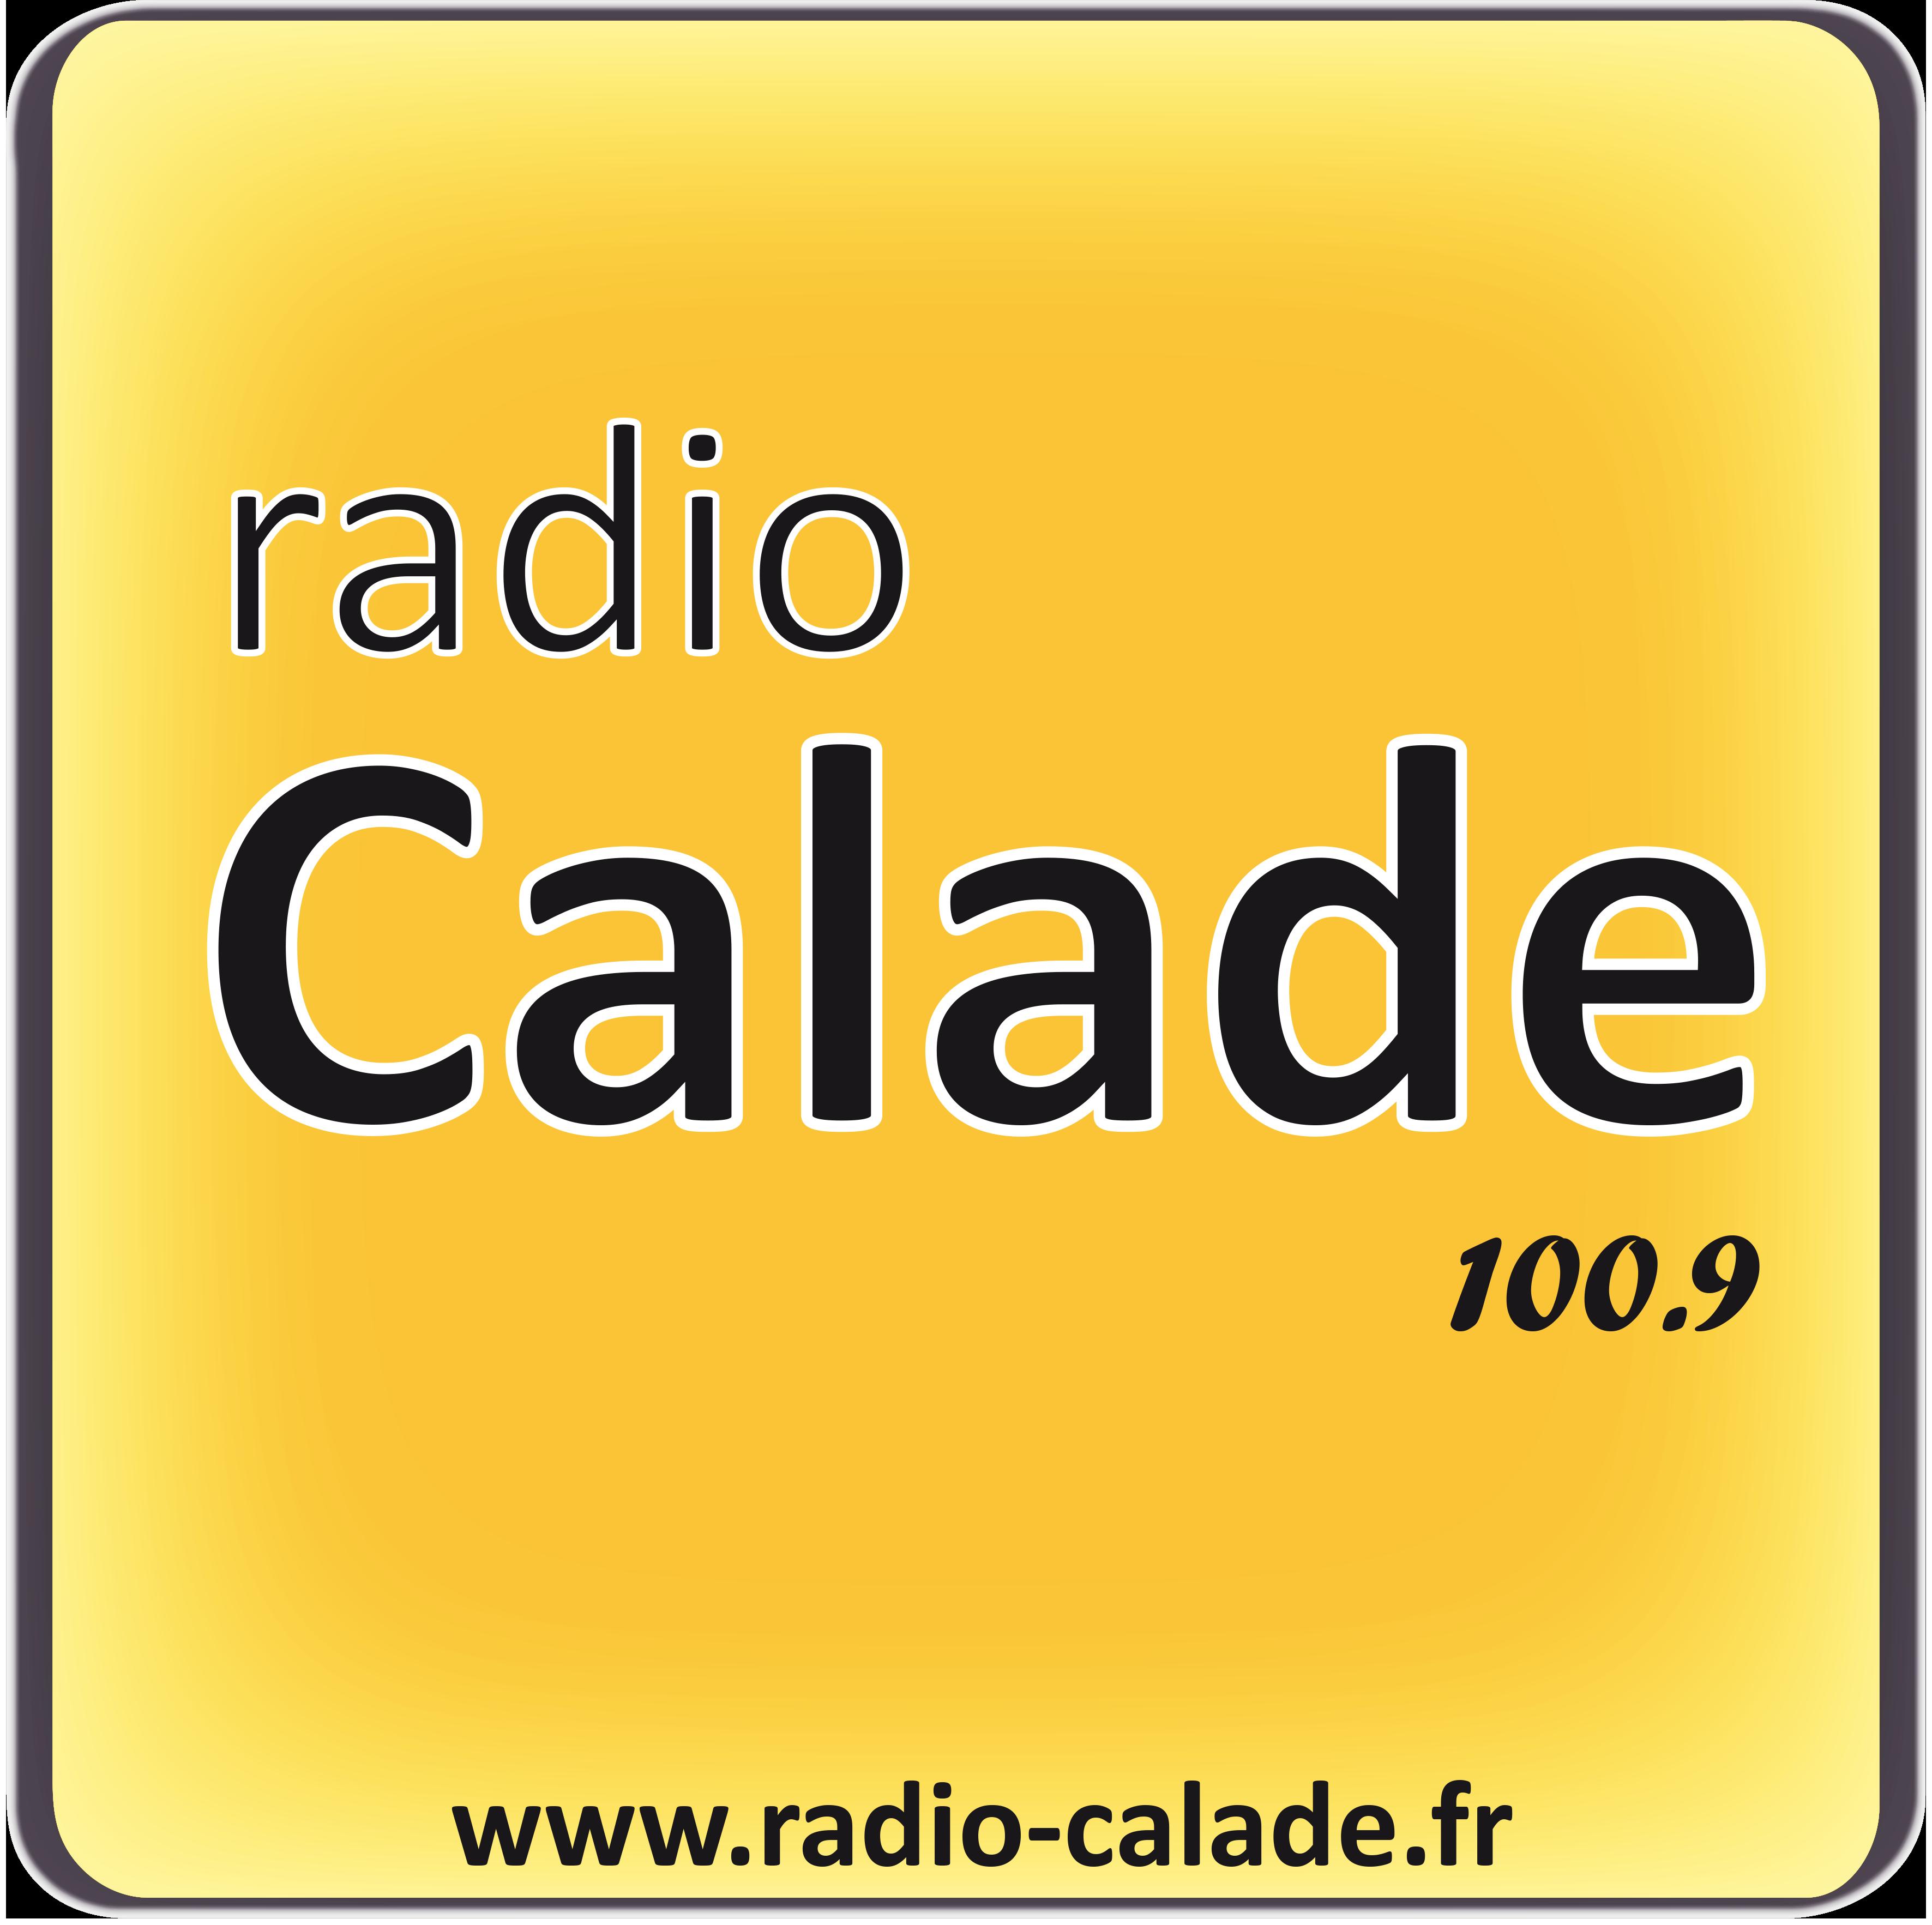 RADIO CALADE logo HD DEF